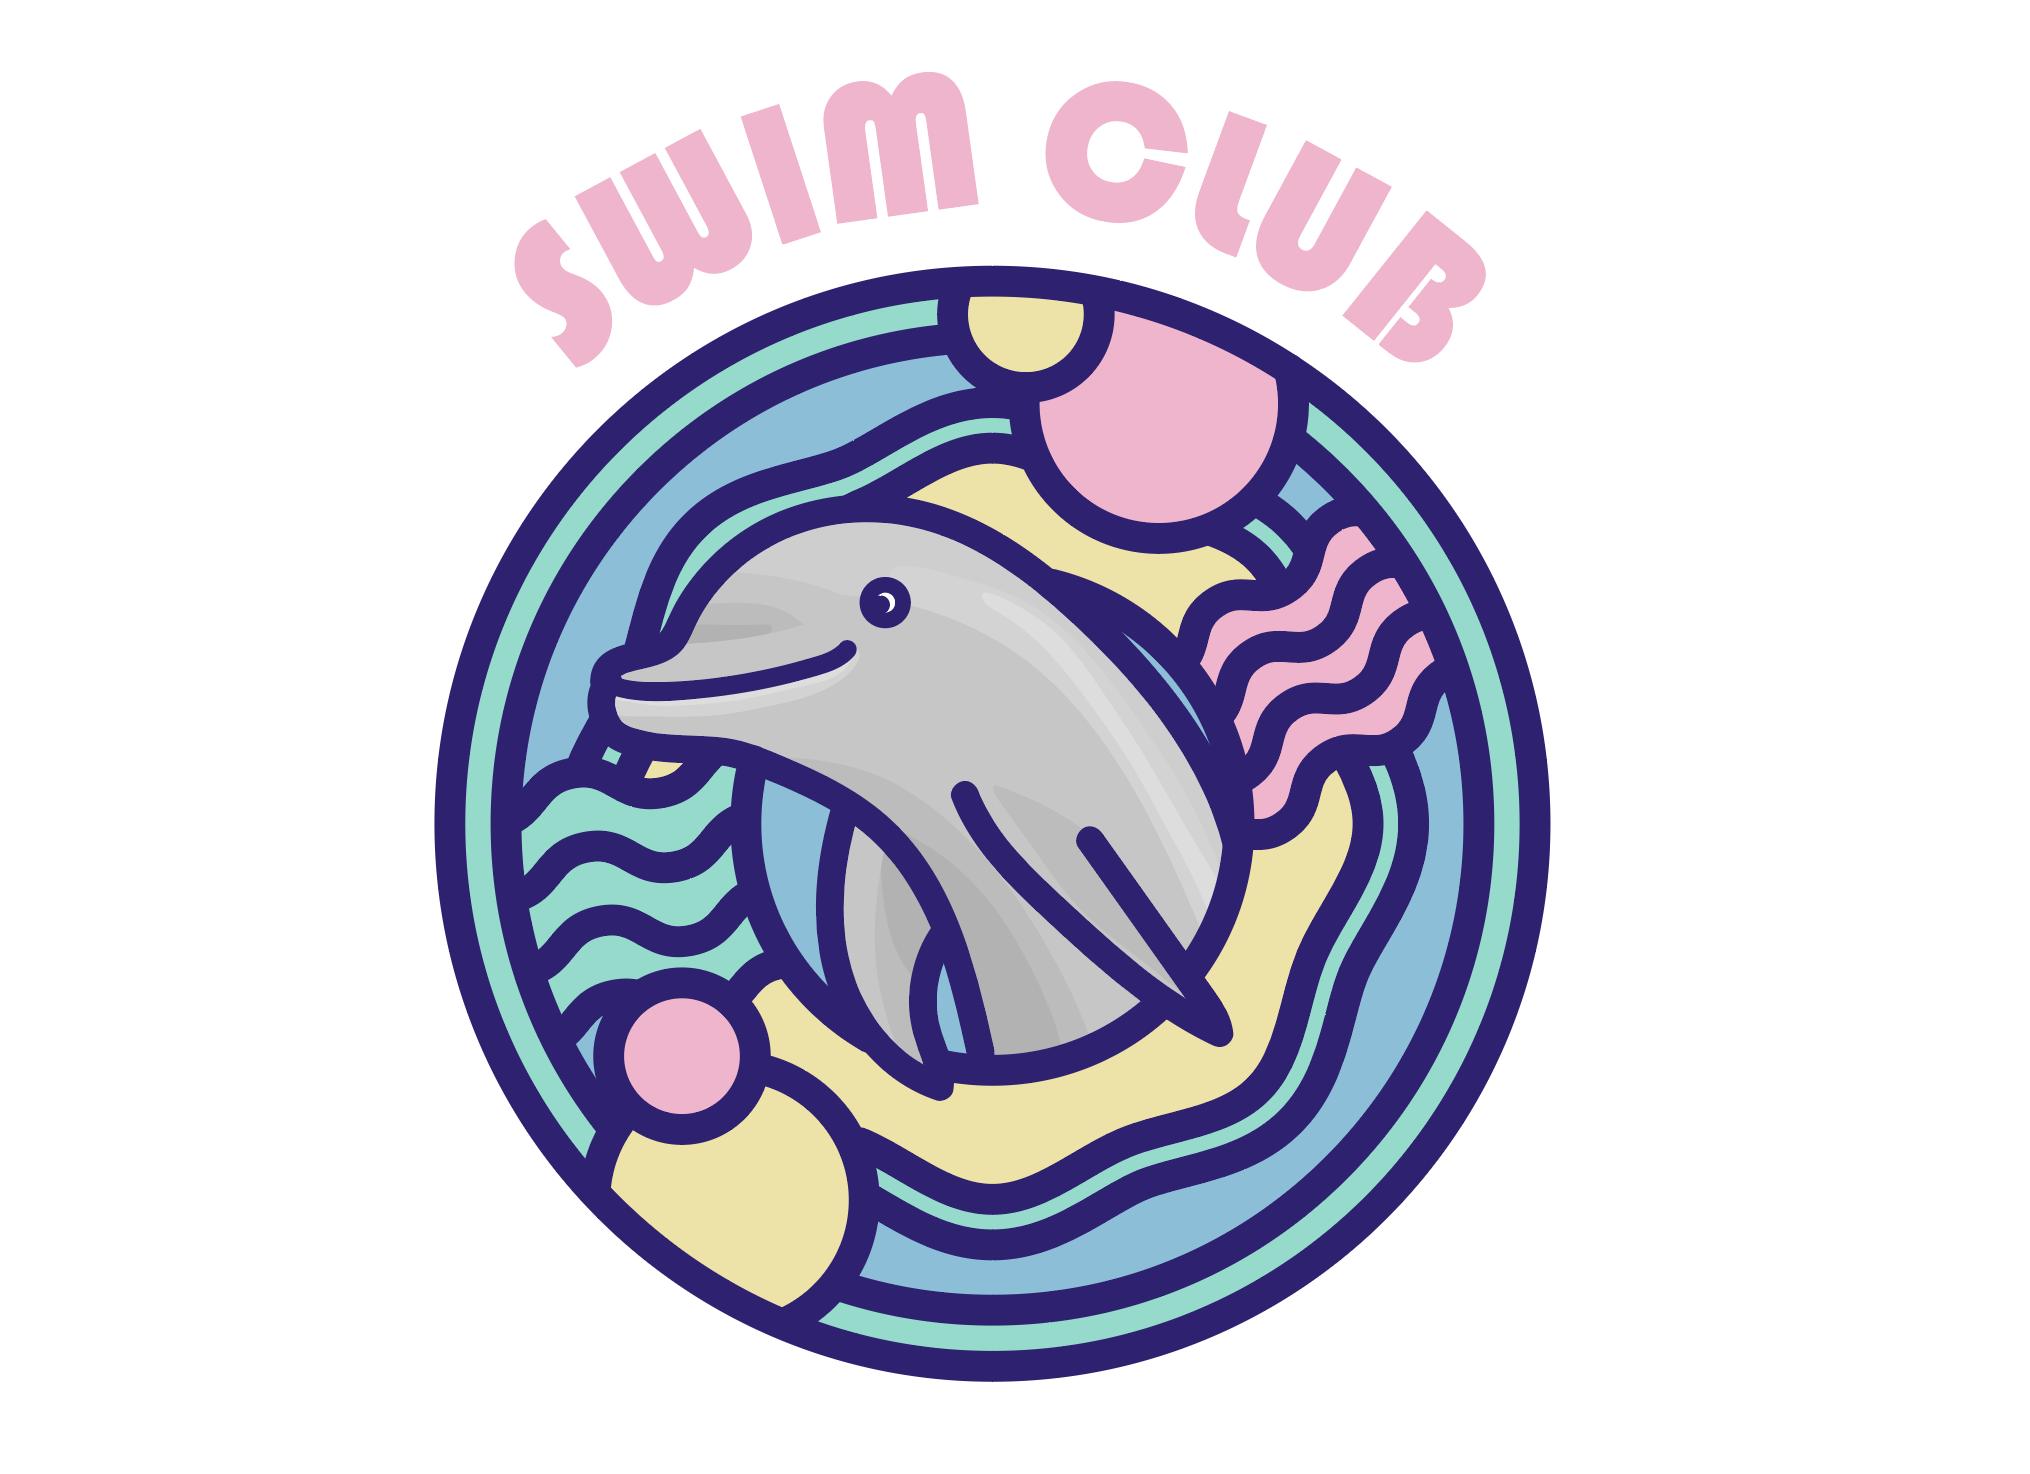 Swim Club Icon Graphic By Mine Eyes Design Creative Fabrica